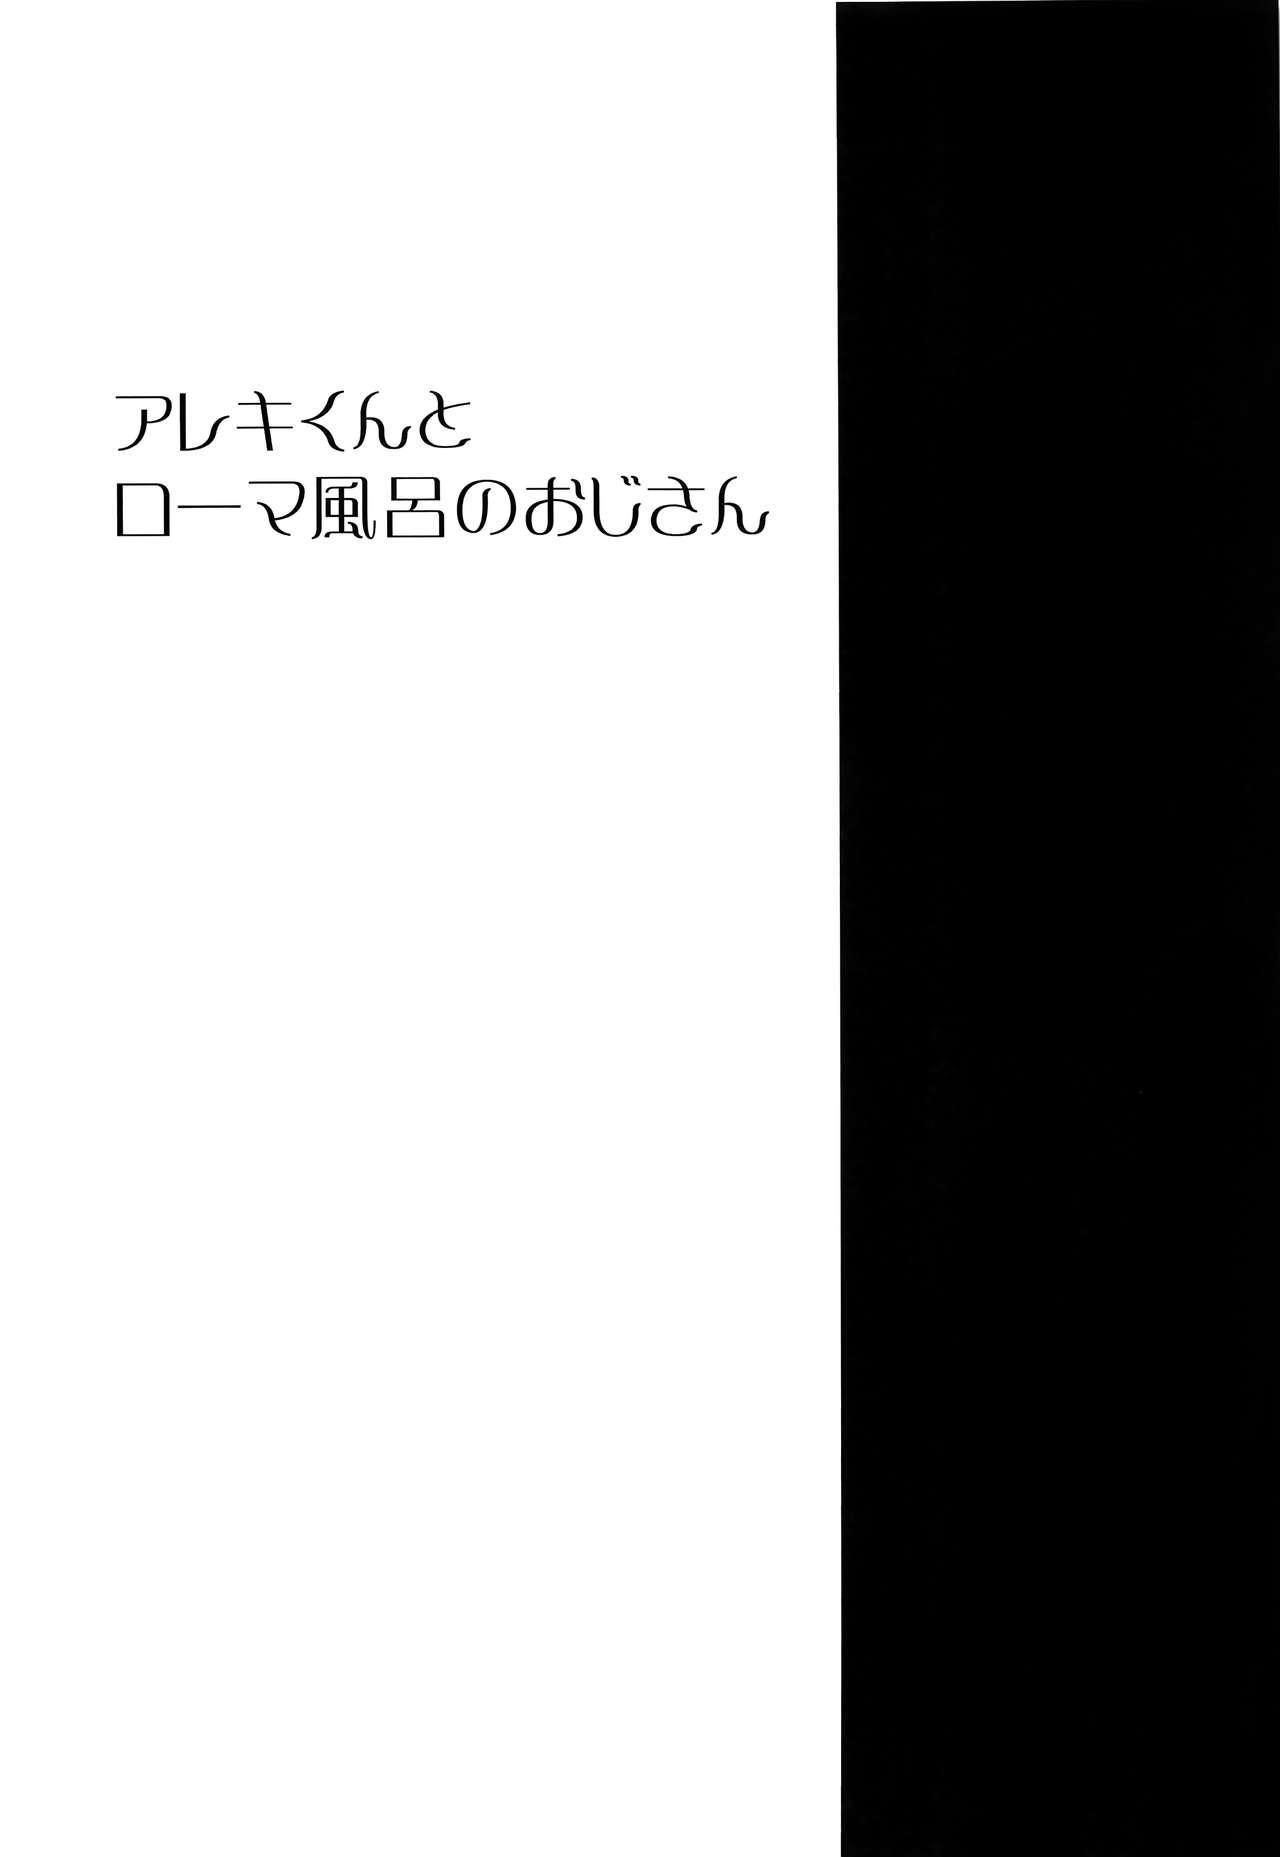 (C97) [Pocorit (Kawasemi Makiko)] Alex-kun to Rome Furo no Oji-san (Fate/Grand Order) [English] {Chin²} 1